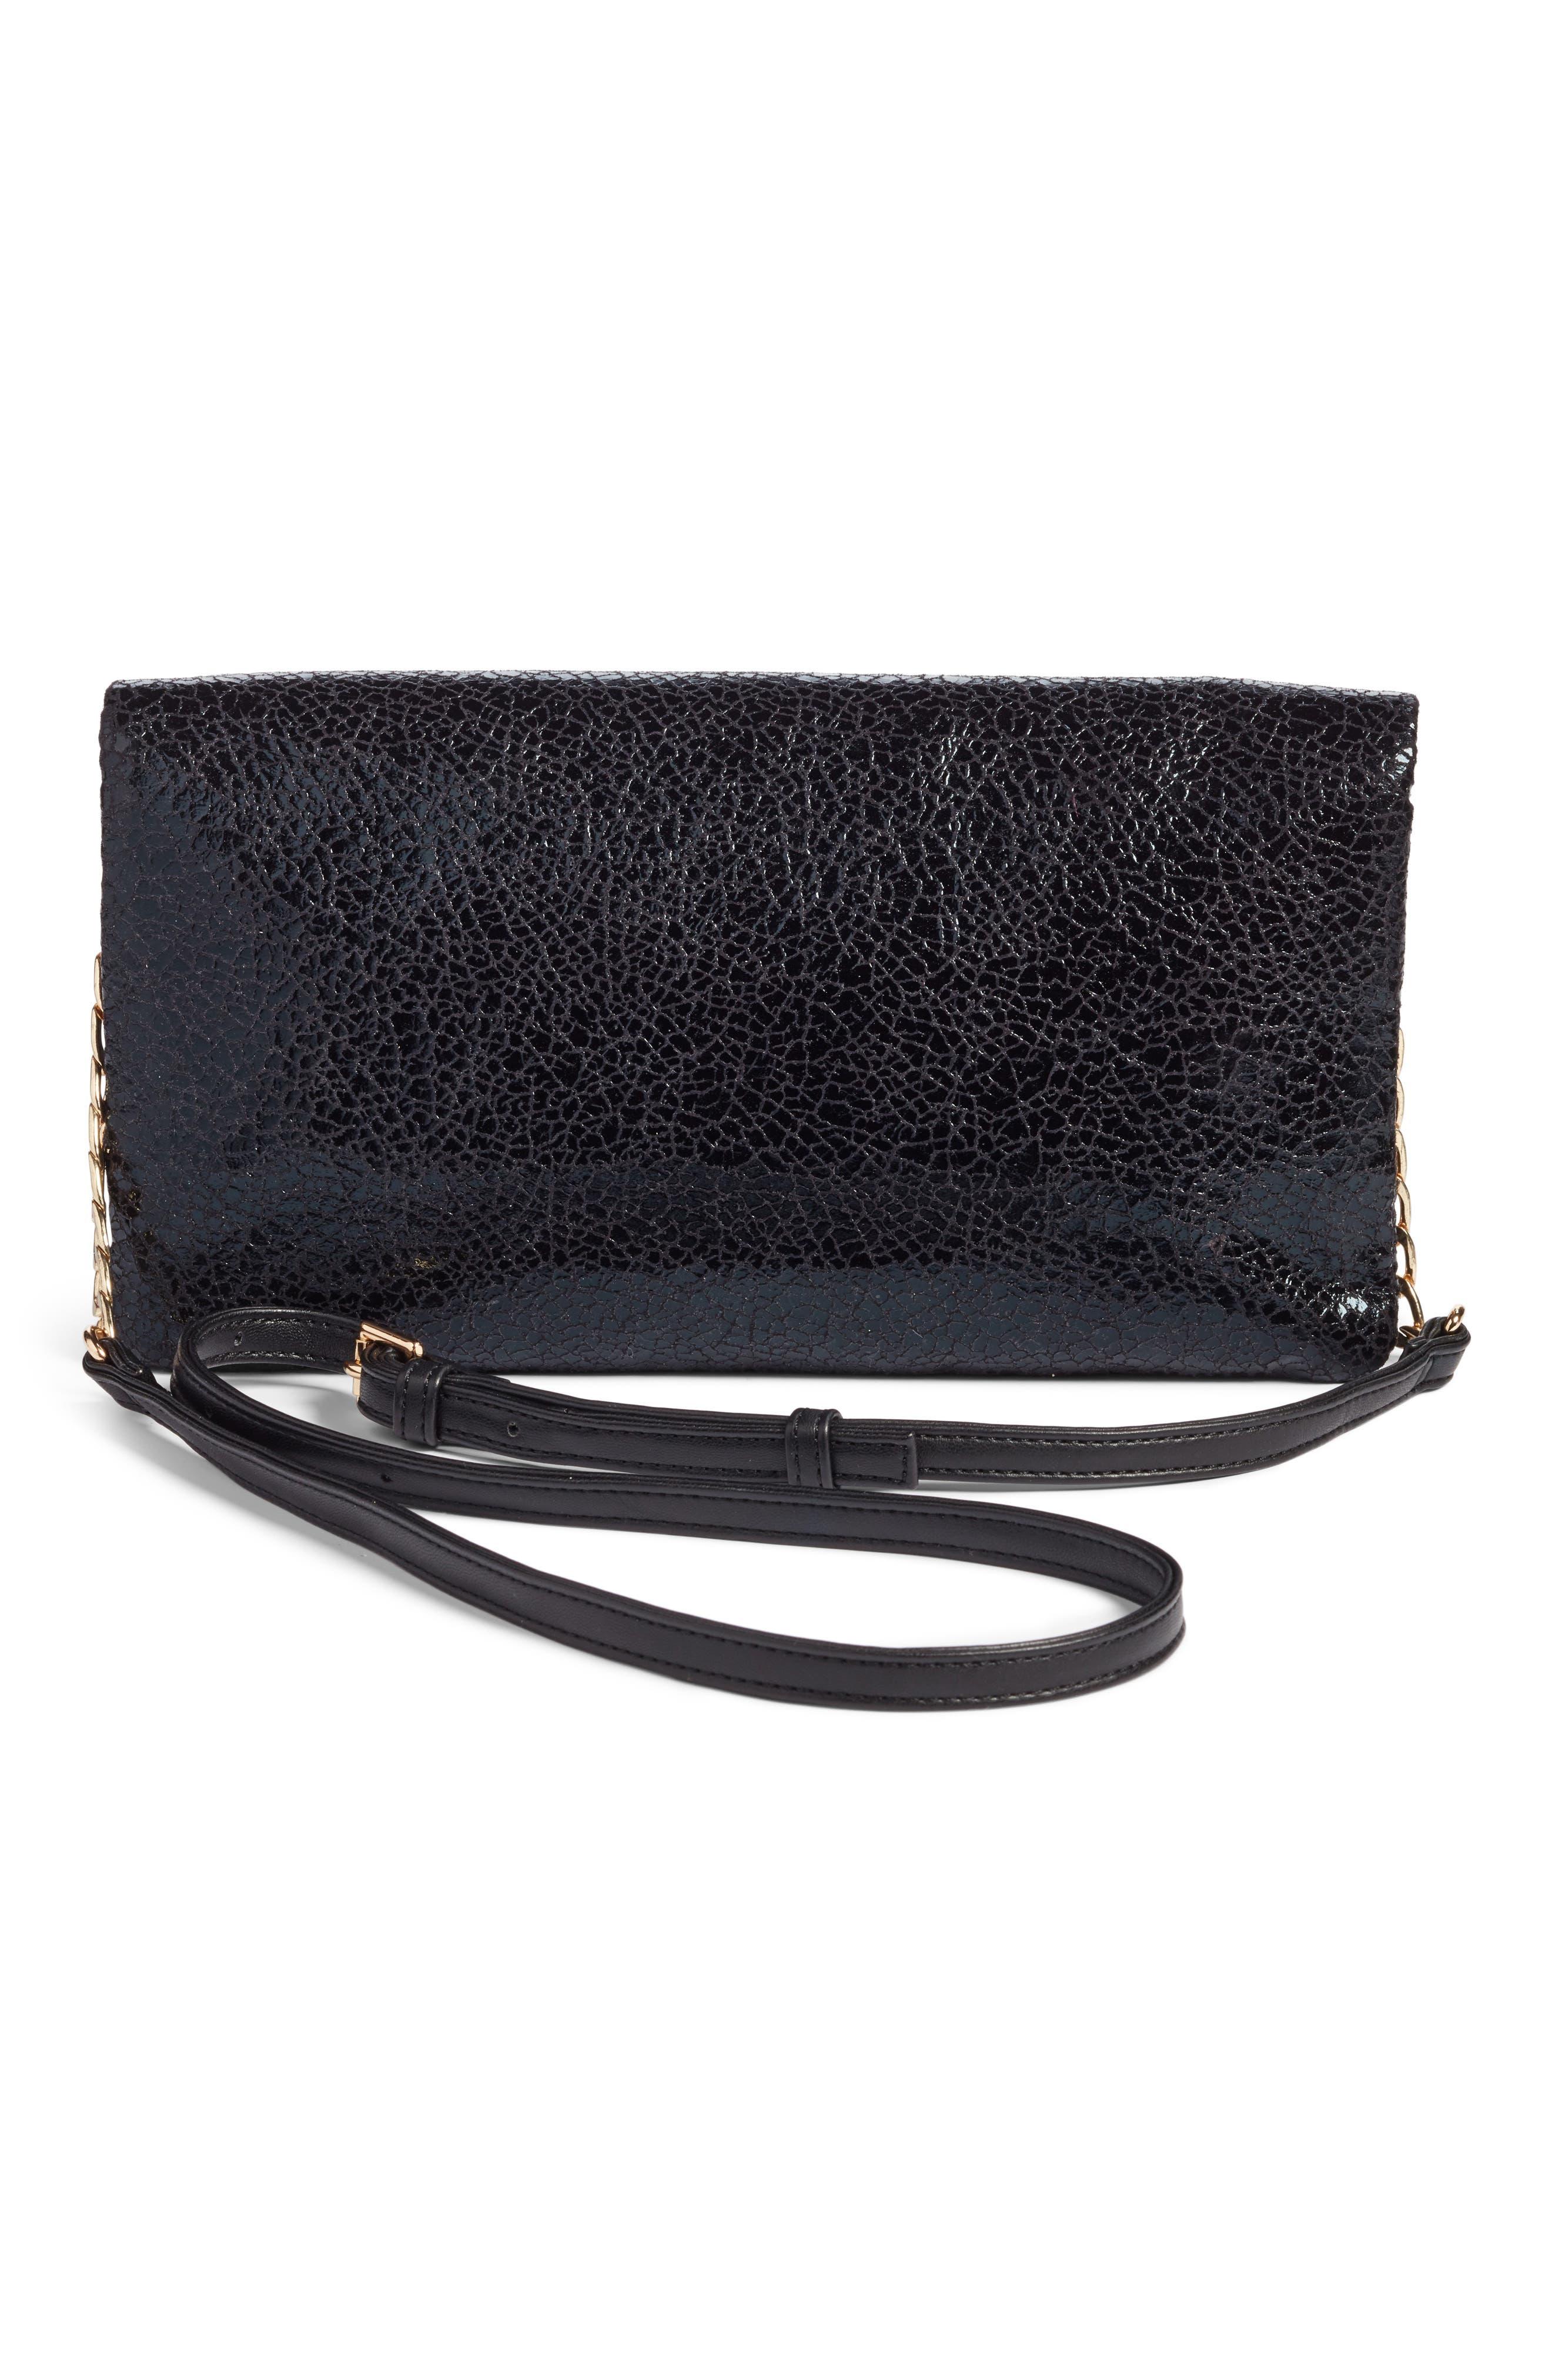 Black Crackle Faux Leather Foldover Clutch,                             Alternate thumbnail 3, color,                             001